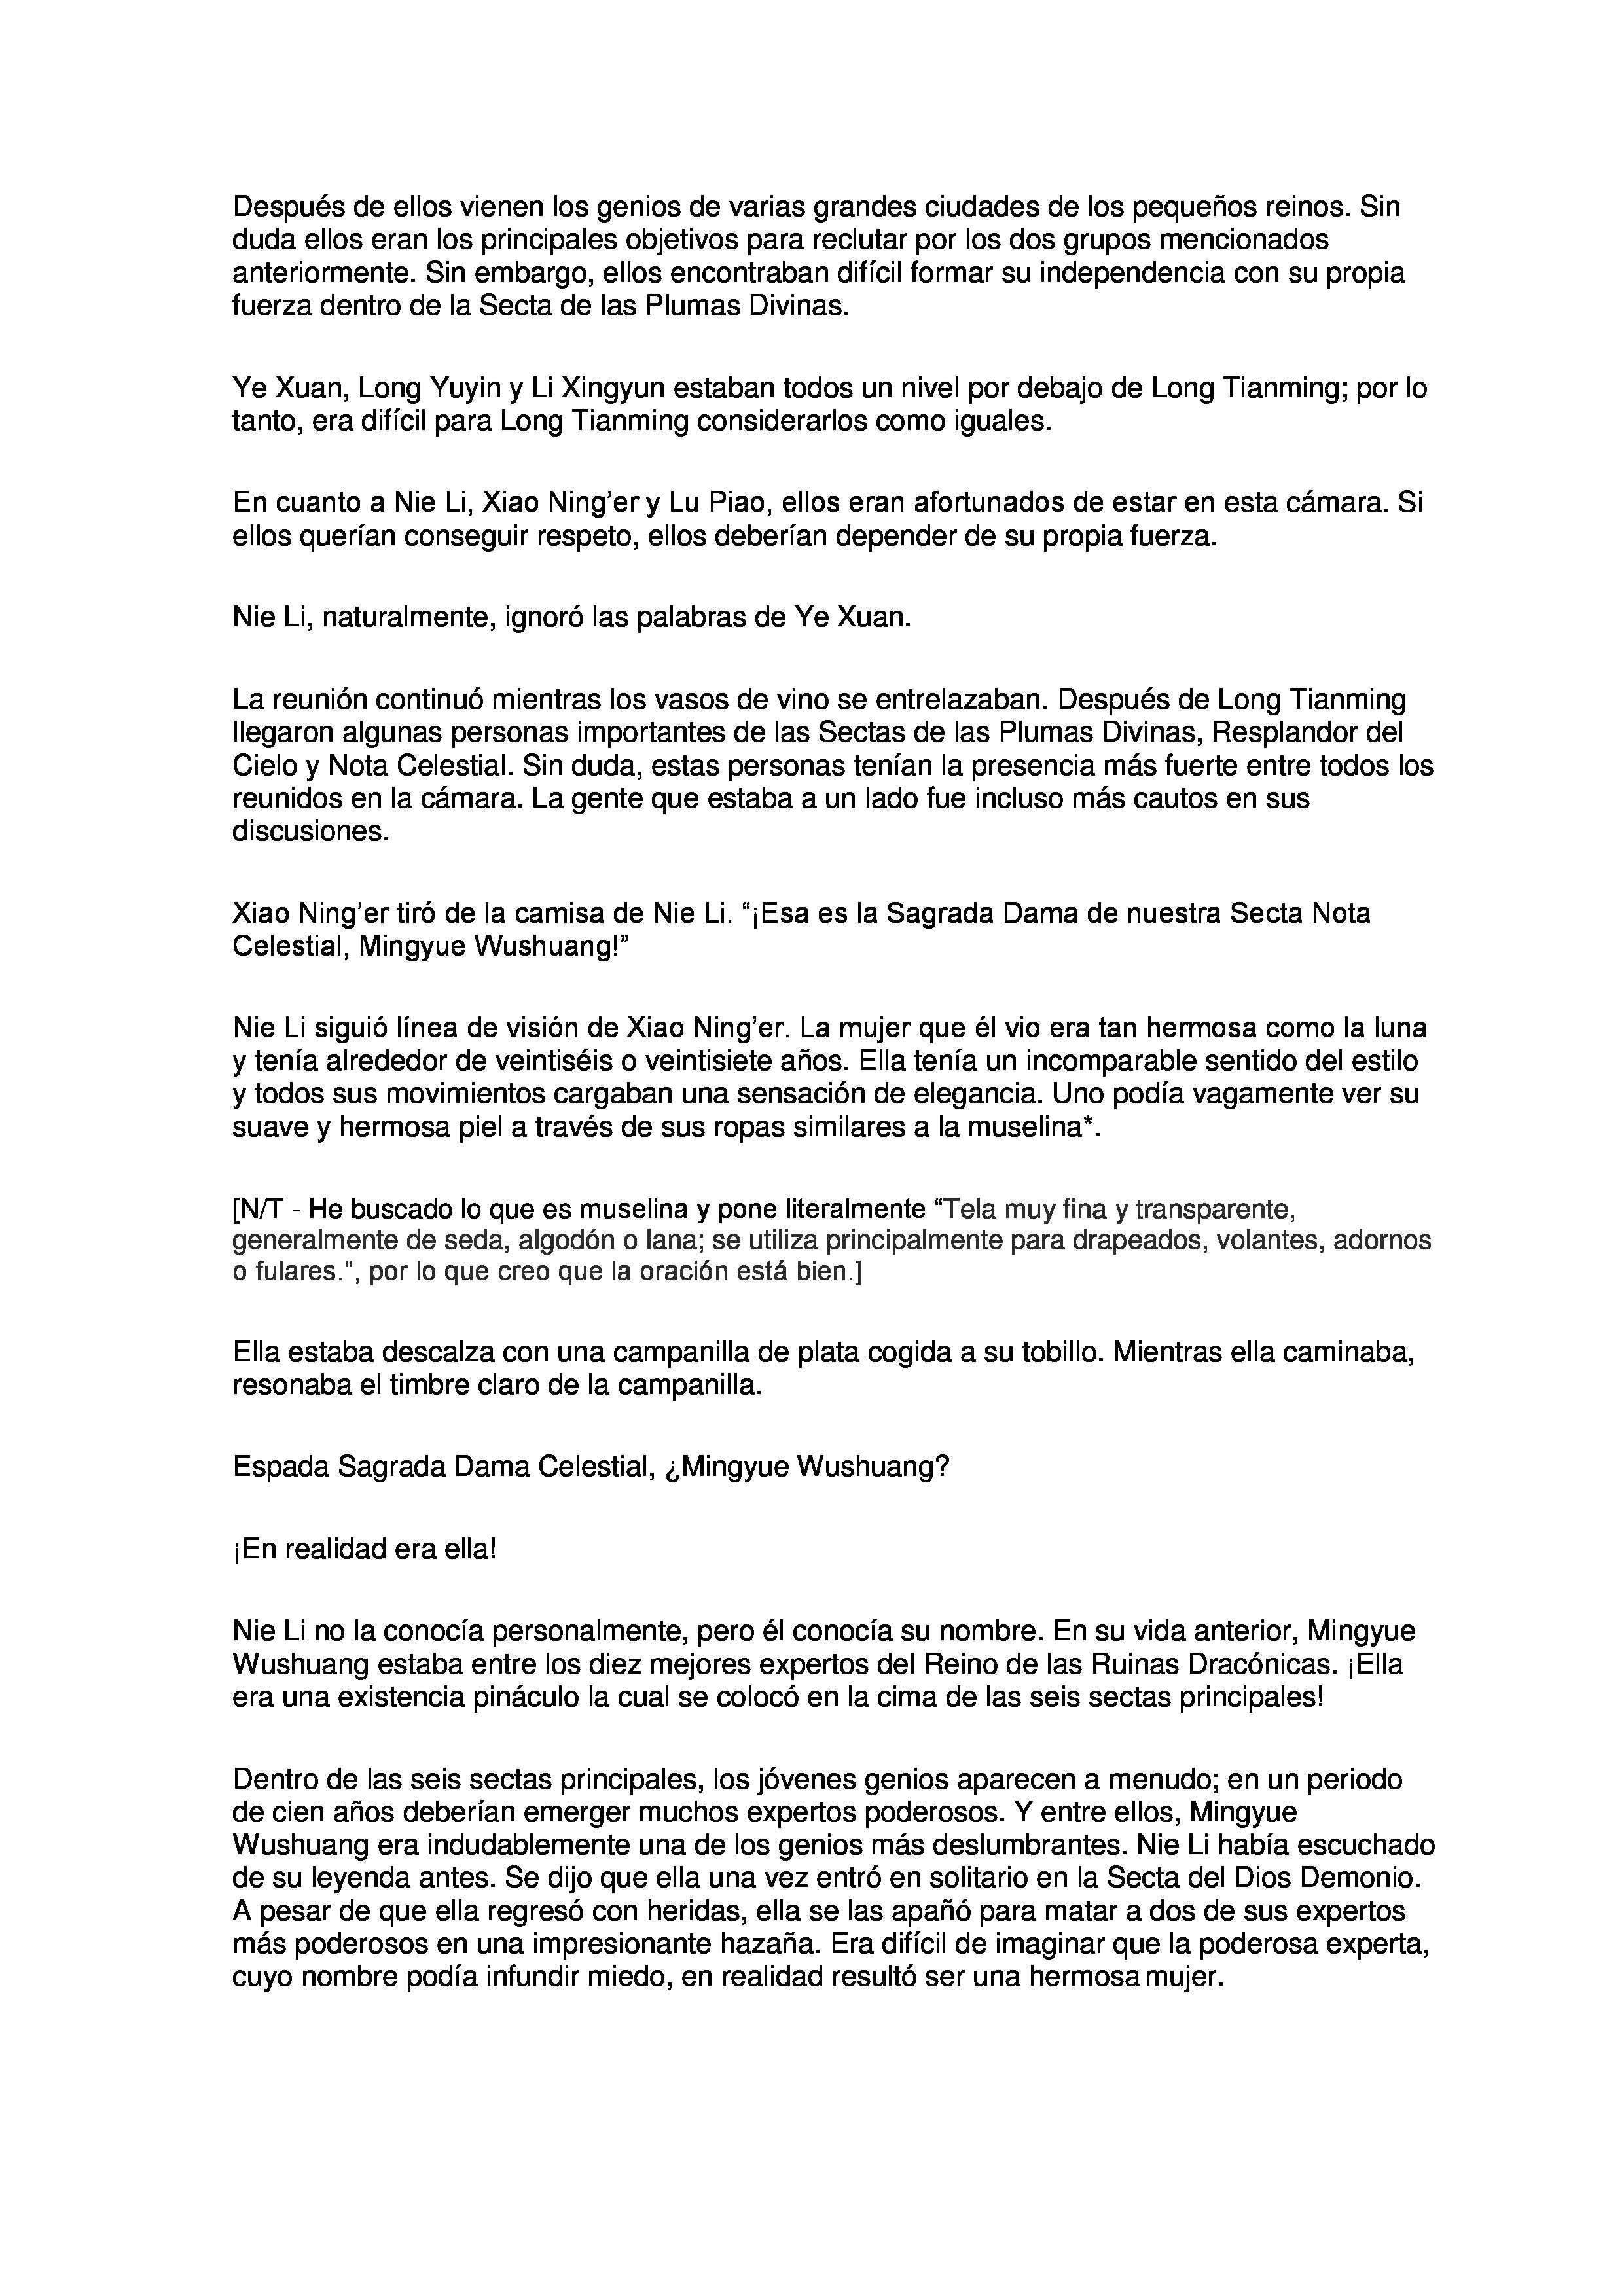 http://c5.ninemanga.com/es_manga/pic2/44/20012/502459/791a36081ed68160162026d1fcc3c701.jpg Page 2